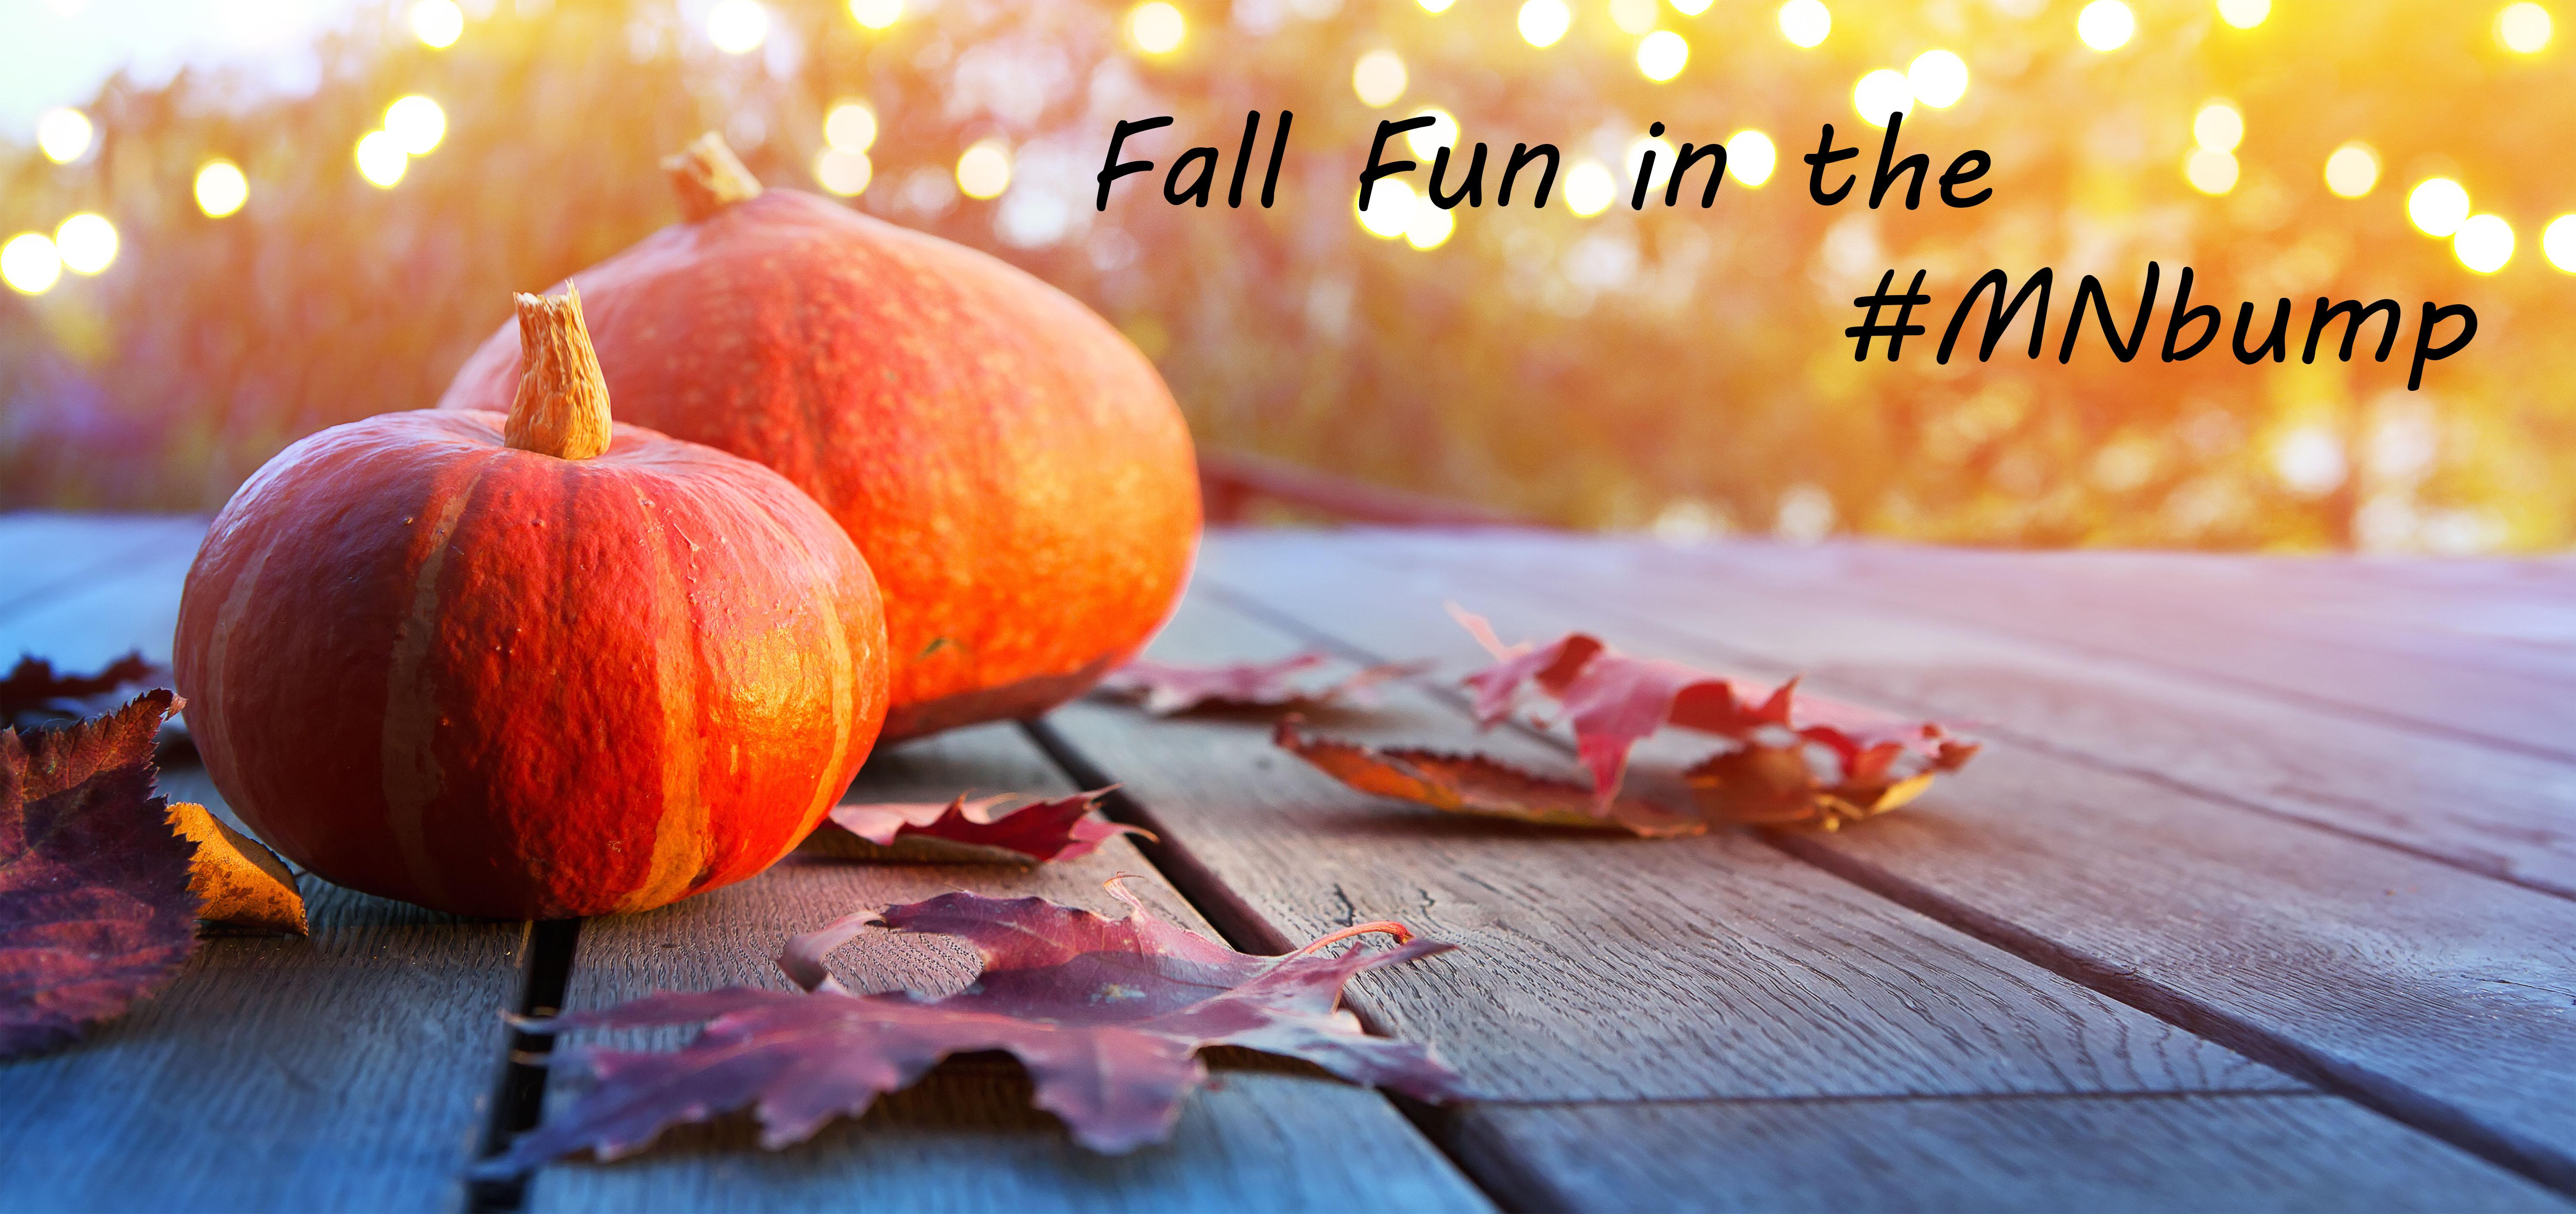 Fun Fall Activities in the #MNbump